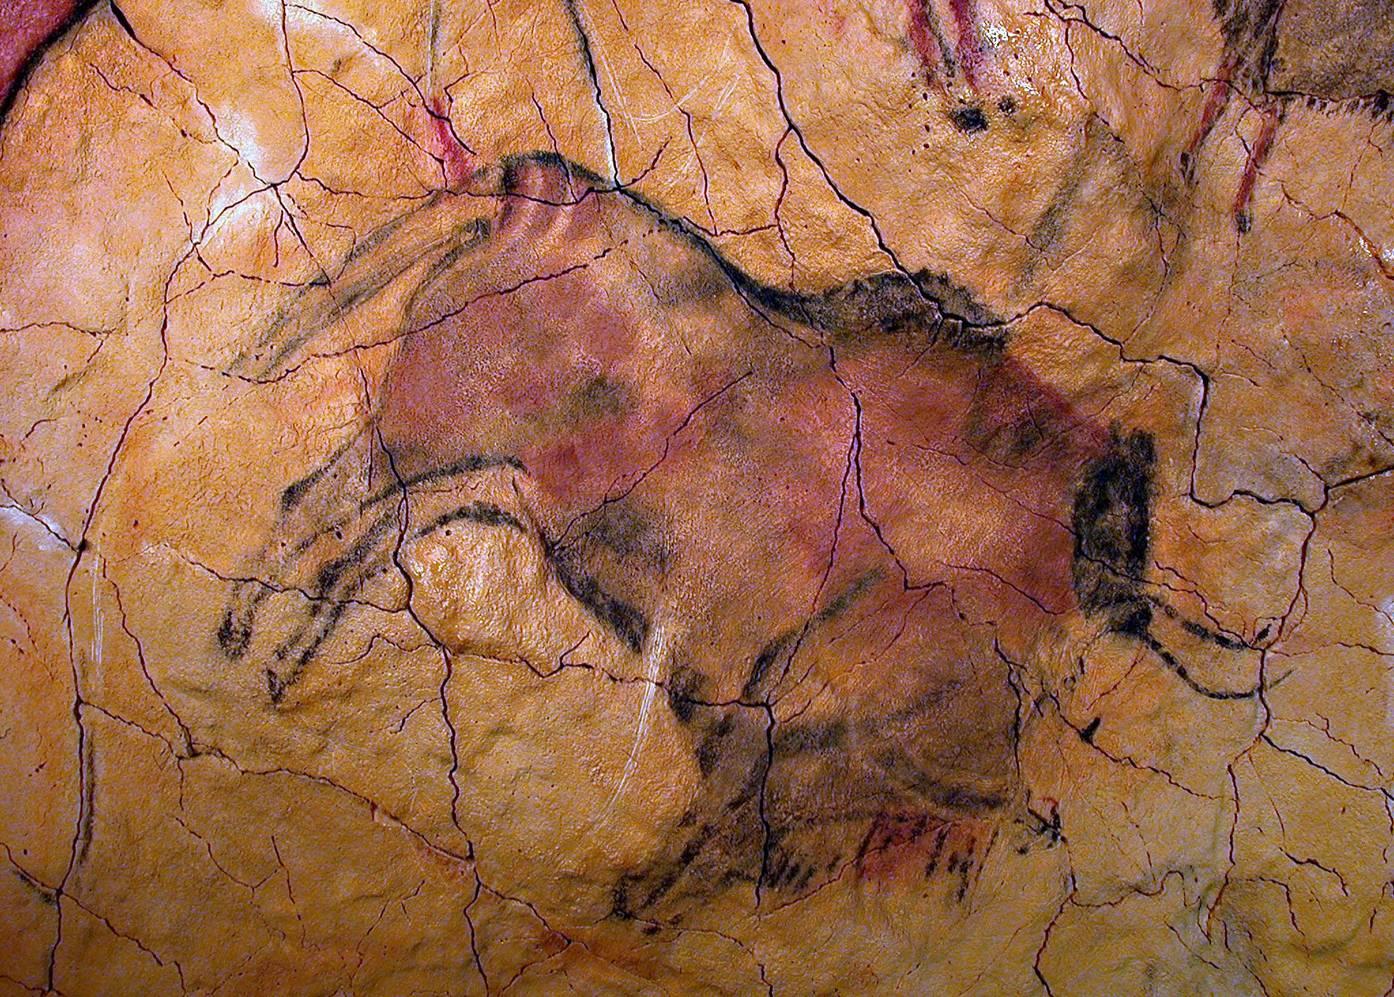 caracteristica del arte prehistorico: